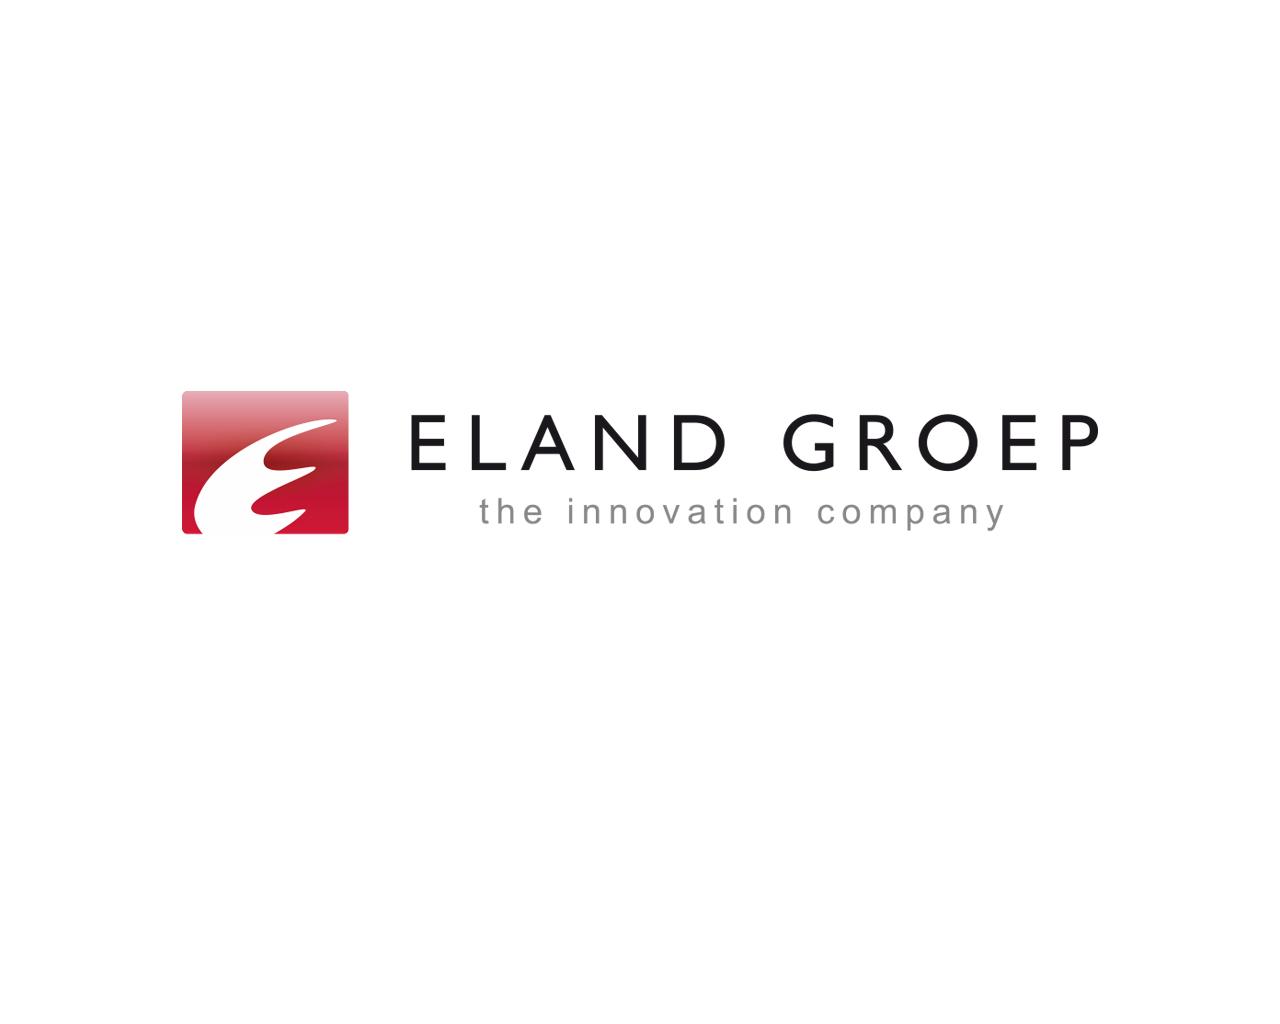 logo eland groep